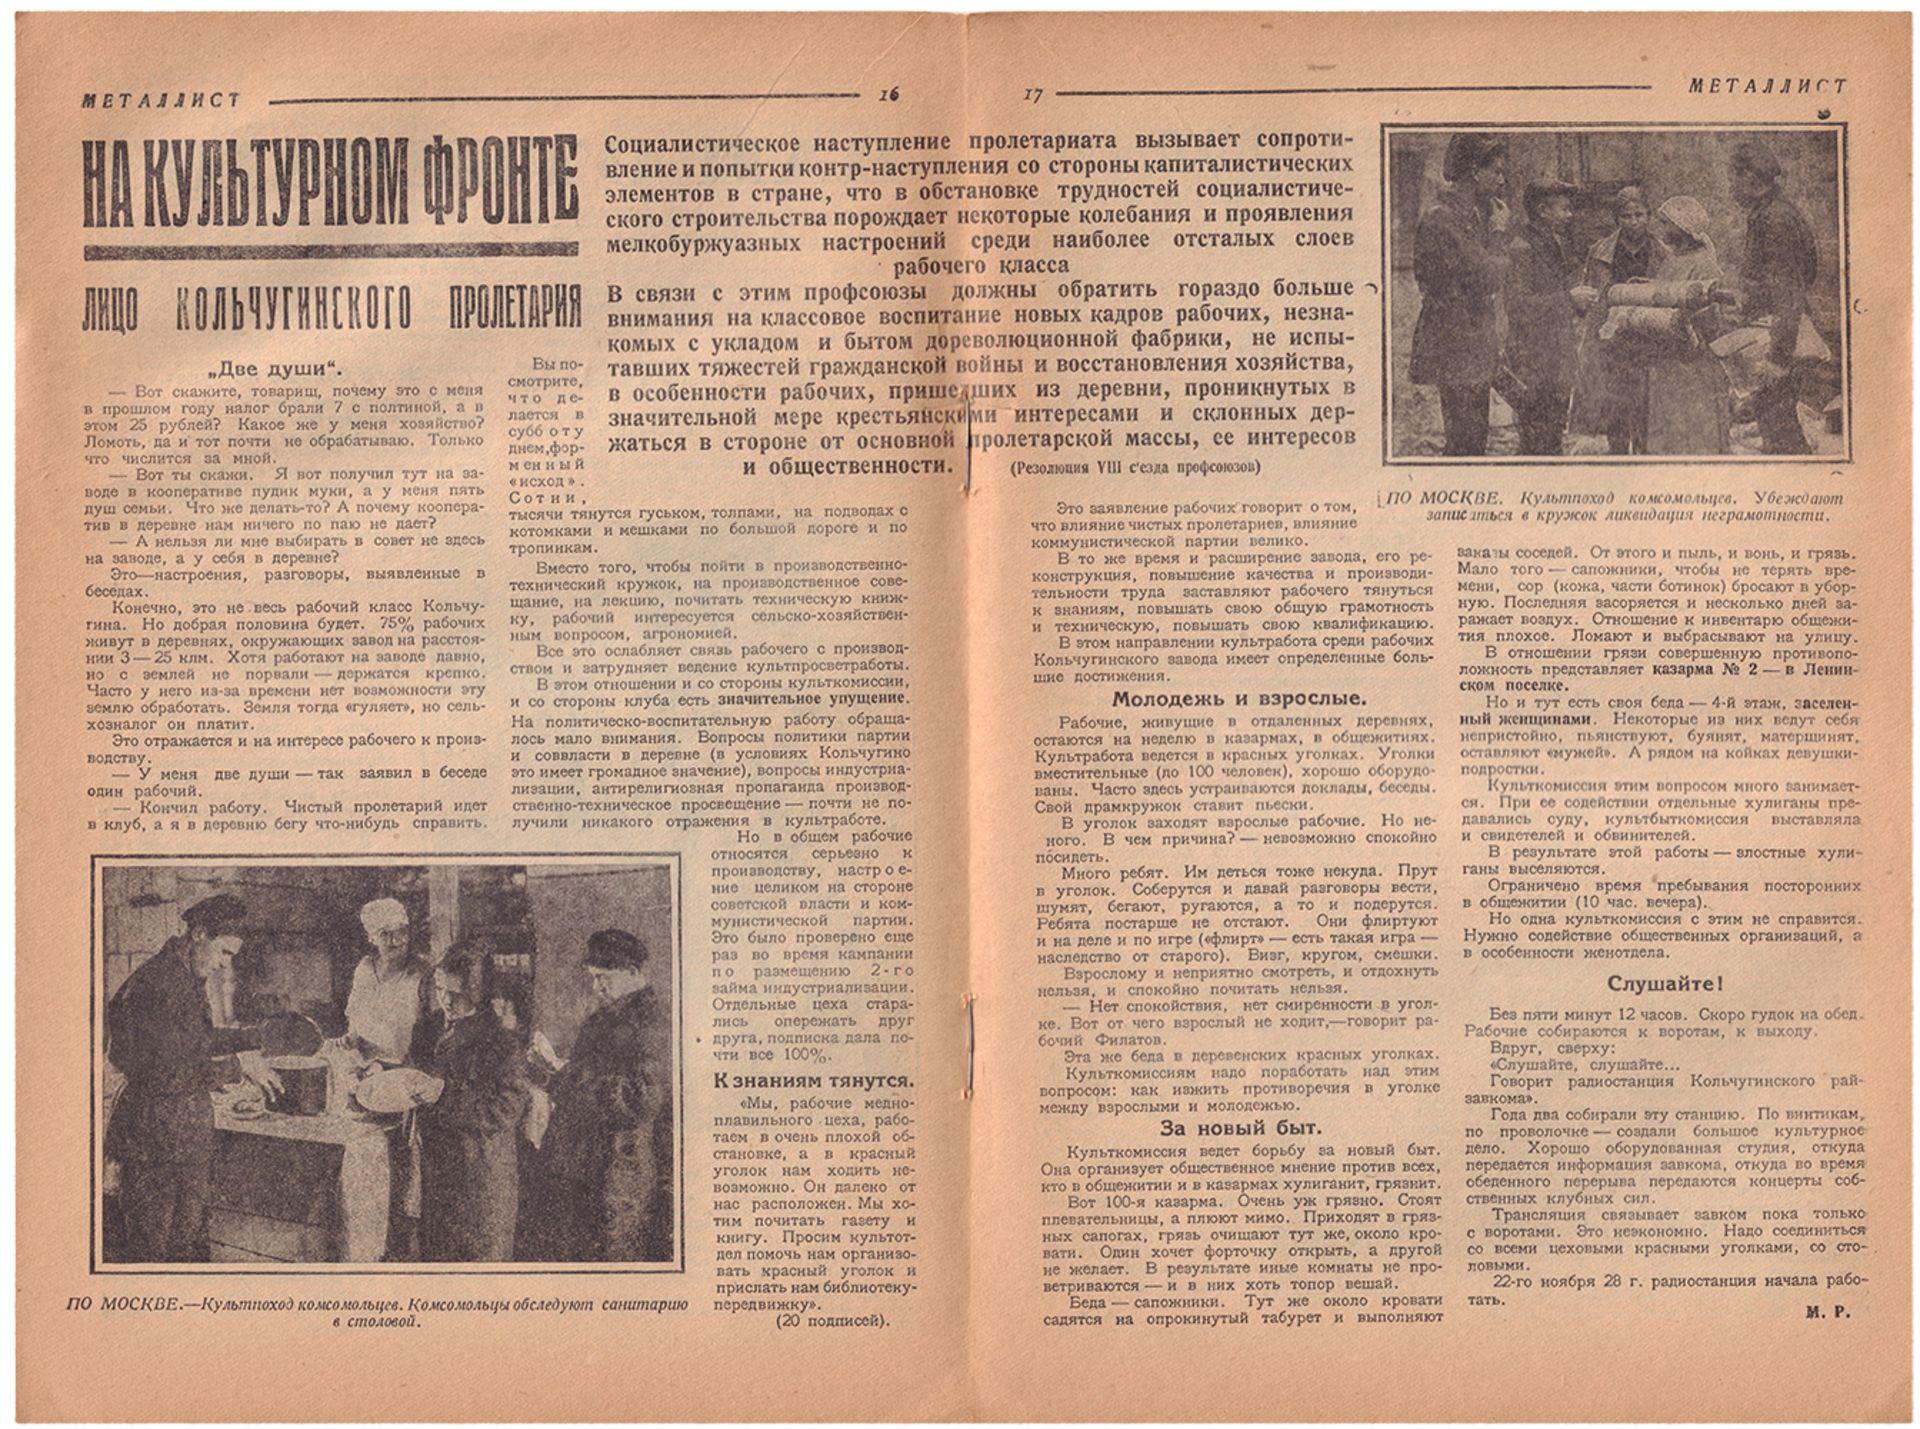 [Soviet art]. Metalworker. Issue 48th. Moscow, 1928. - [1], 32, [1] pp.: ill.; 25,2x7,5 cm.<br>Origi - Bild 2 aus 3